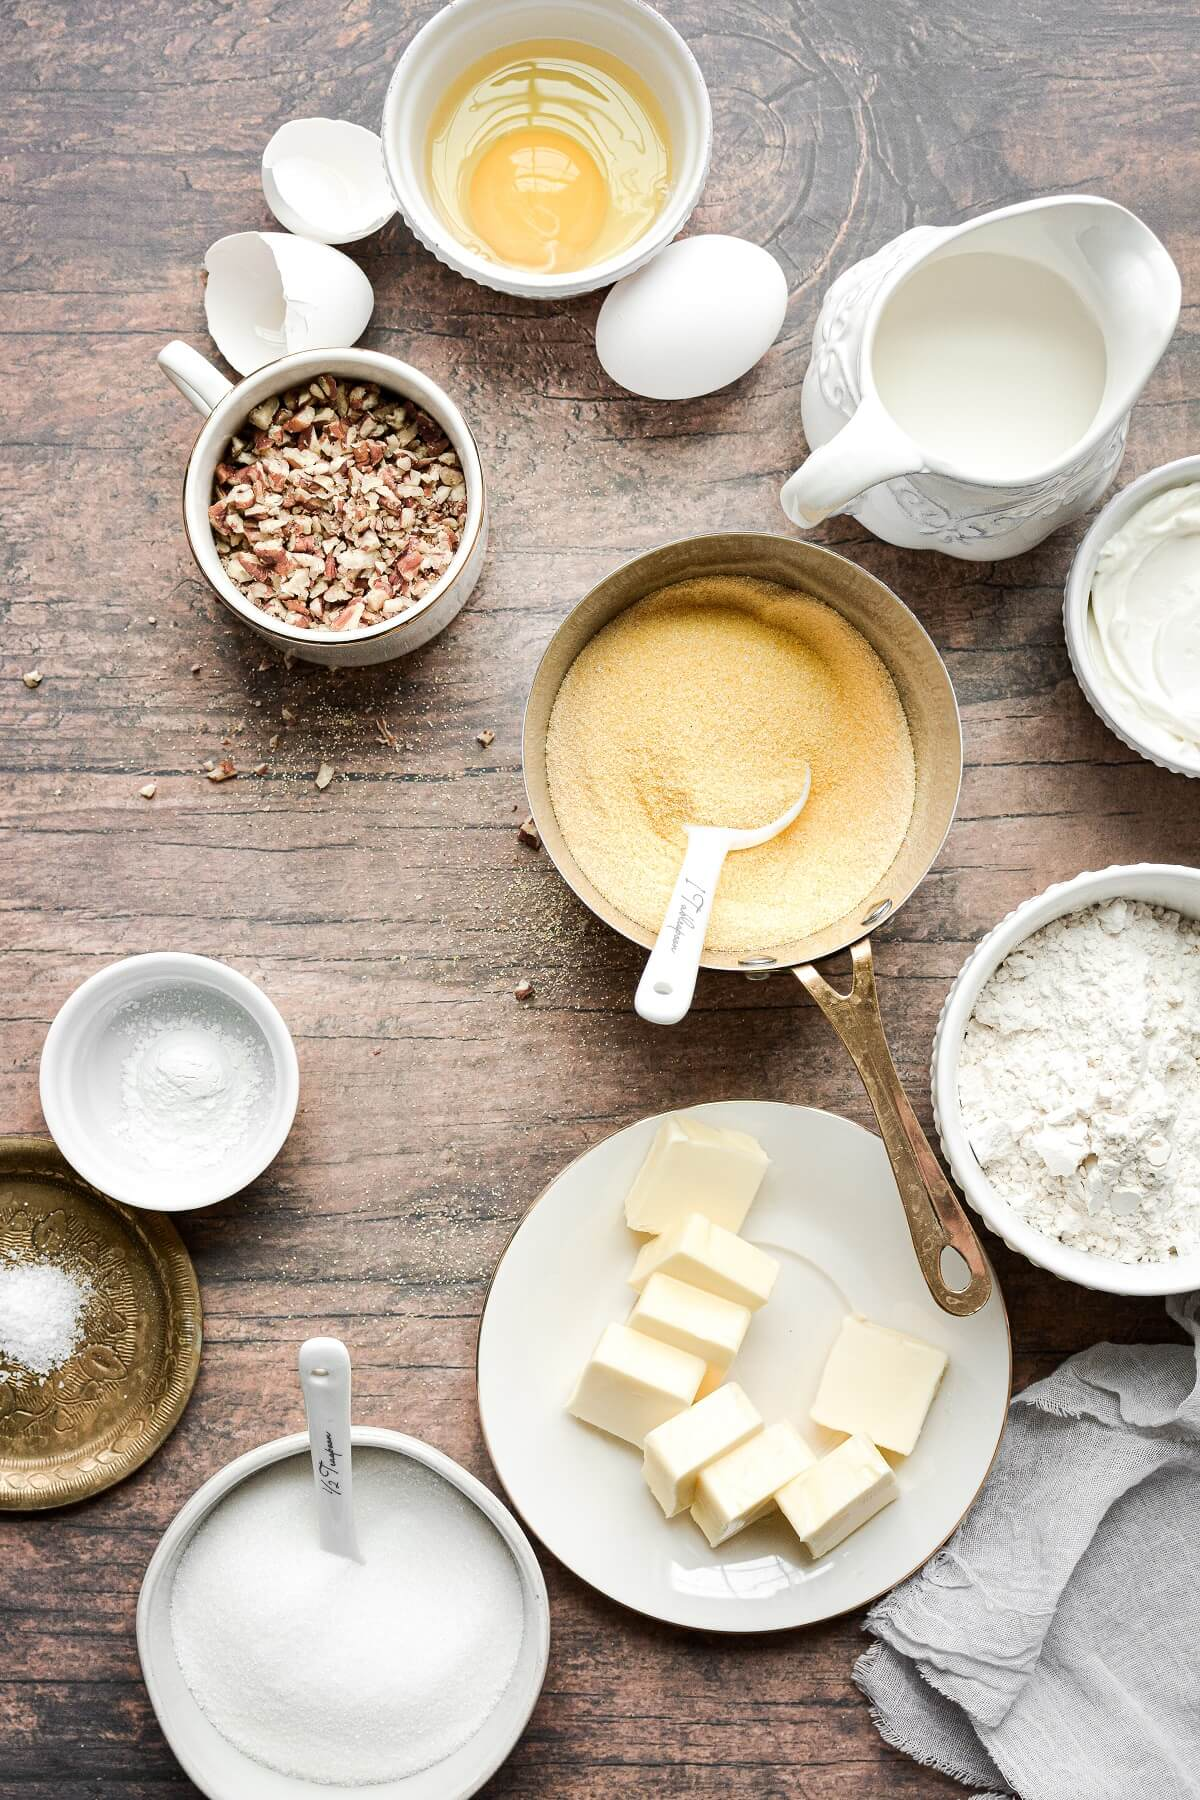 Ingredients for making cornbread.